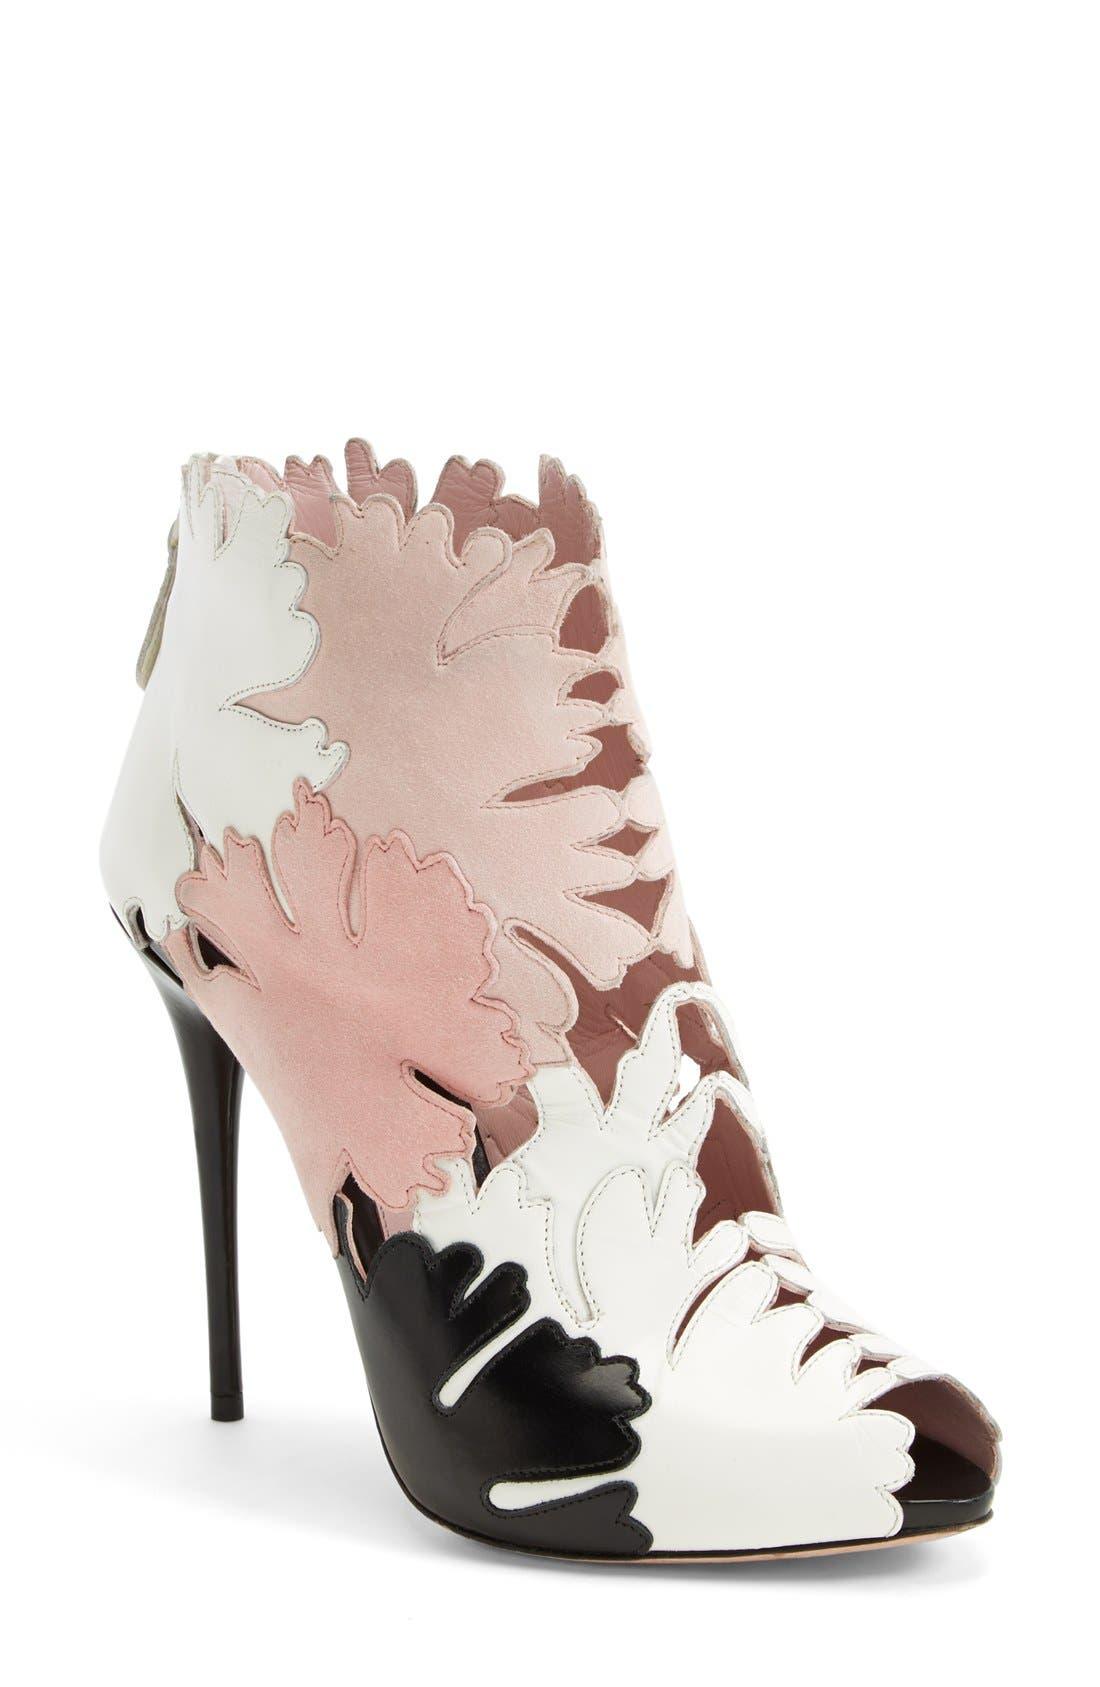 Alternate Image 1 Selected - Alexander McQueen 'Kimono' Cutout Leather Bootie (Women)